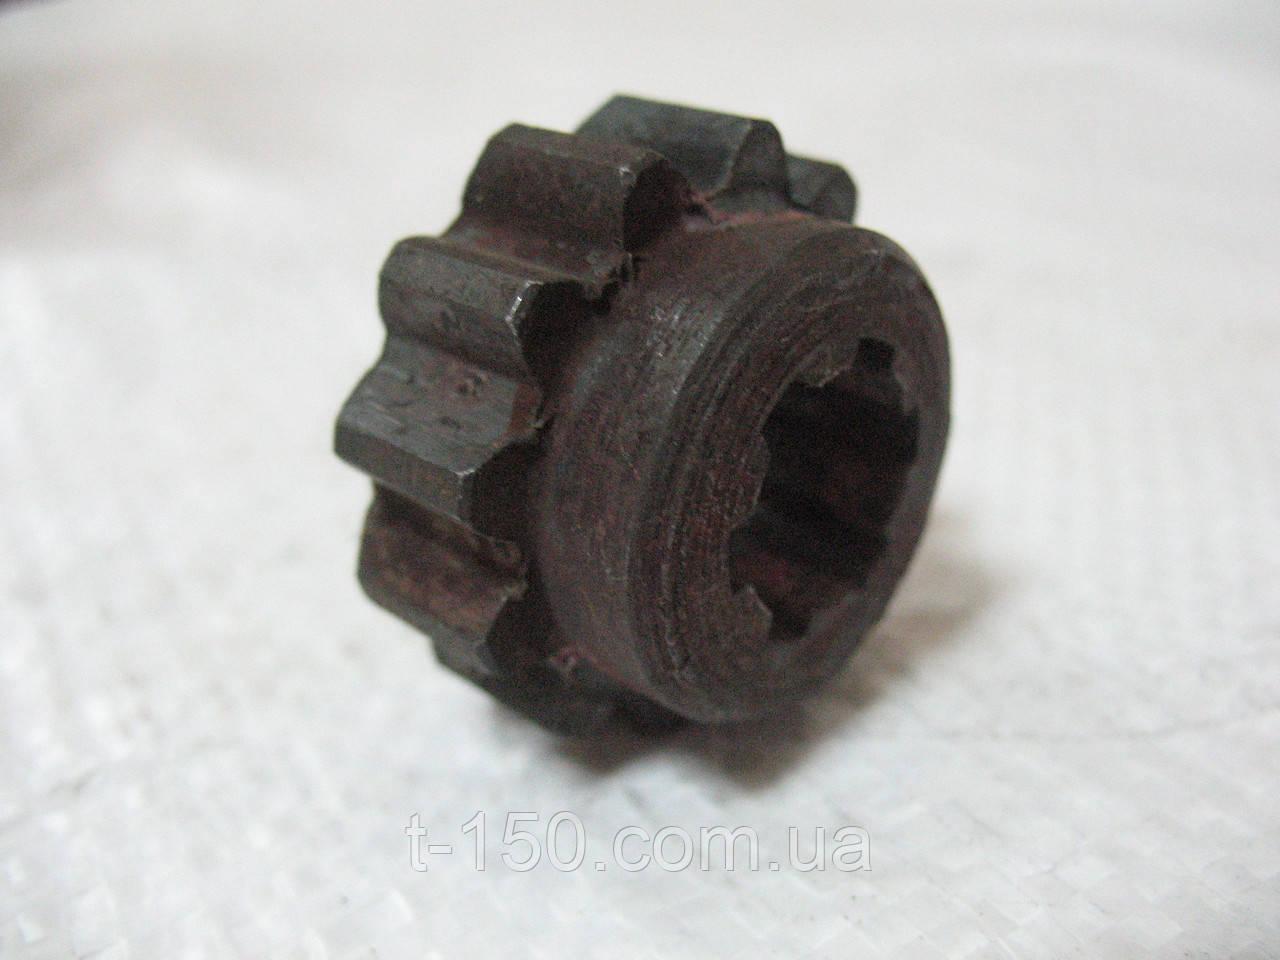 Муфта привода г/насоса Т-16 (СШ20.22.525-1)